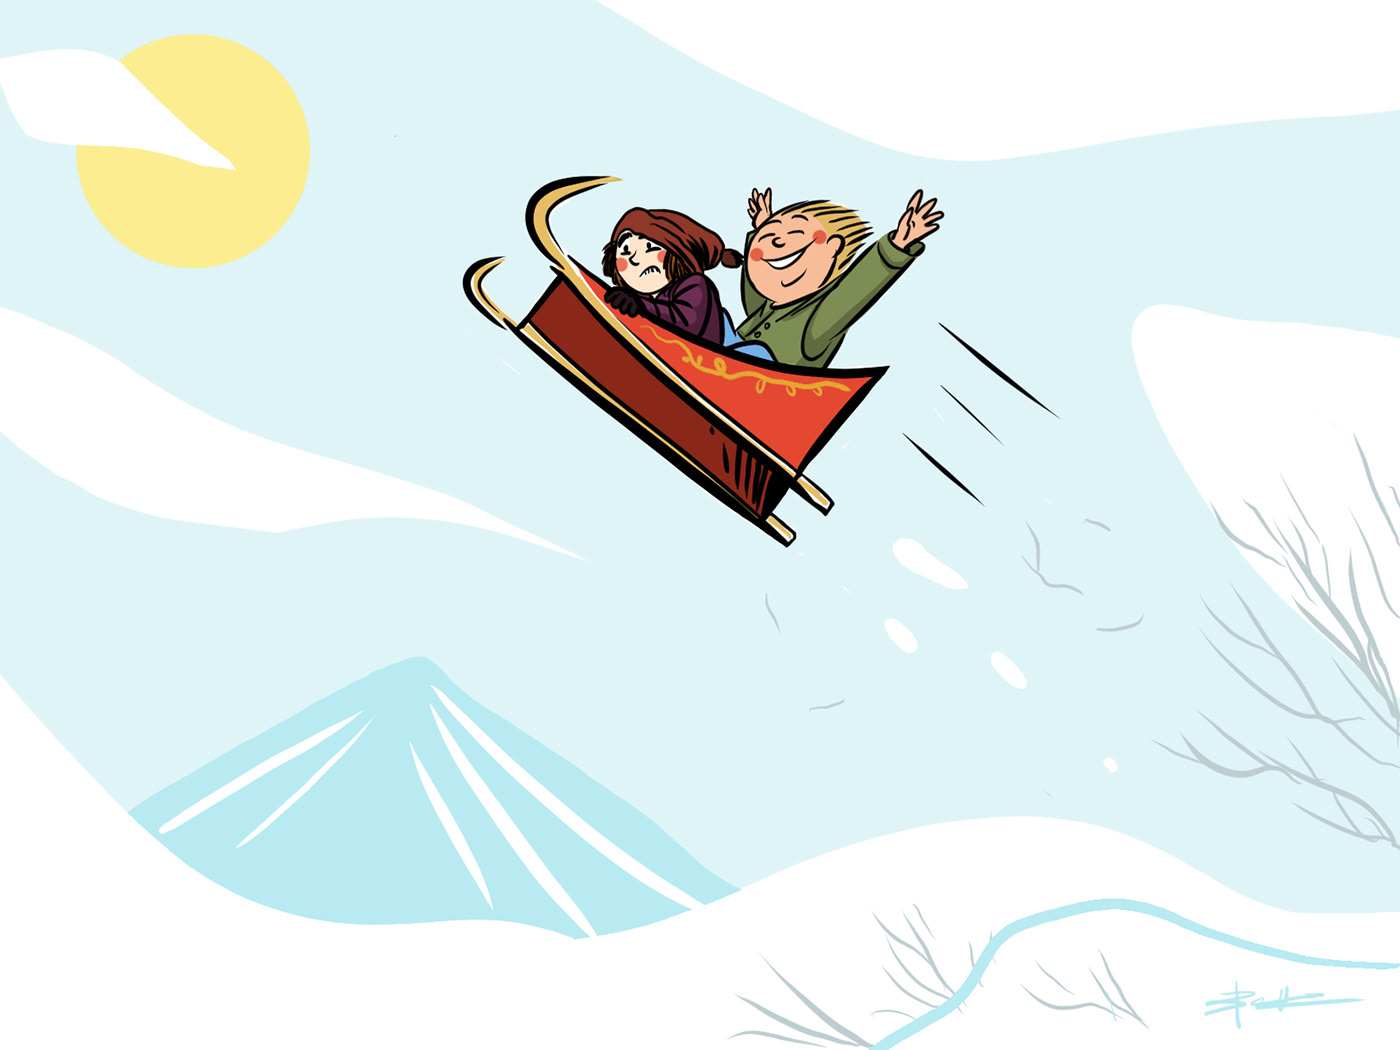 childrens Chistmas ILLUSTRATION  Illustrator ilustracion ilustrador ilustradorinfantil ChildrenIllustration iIllustration